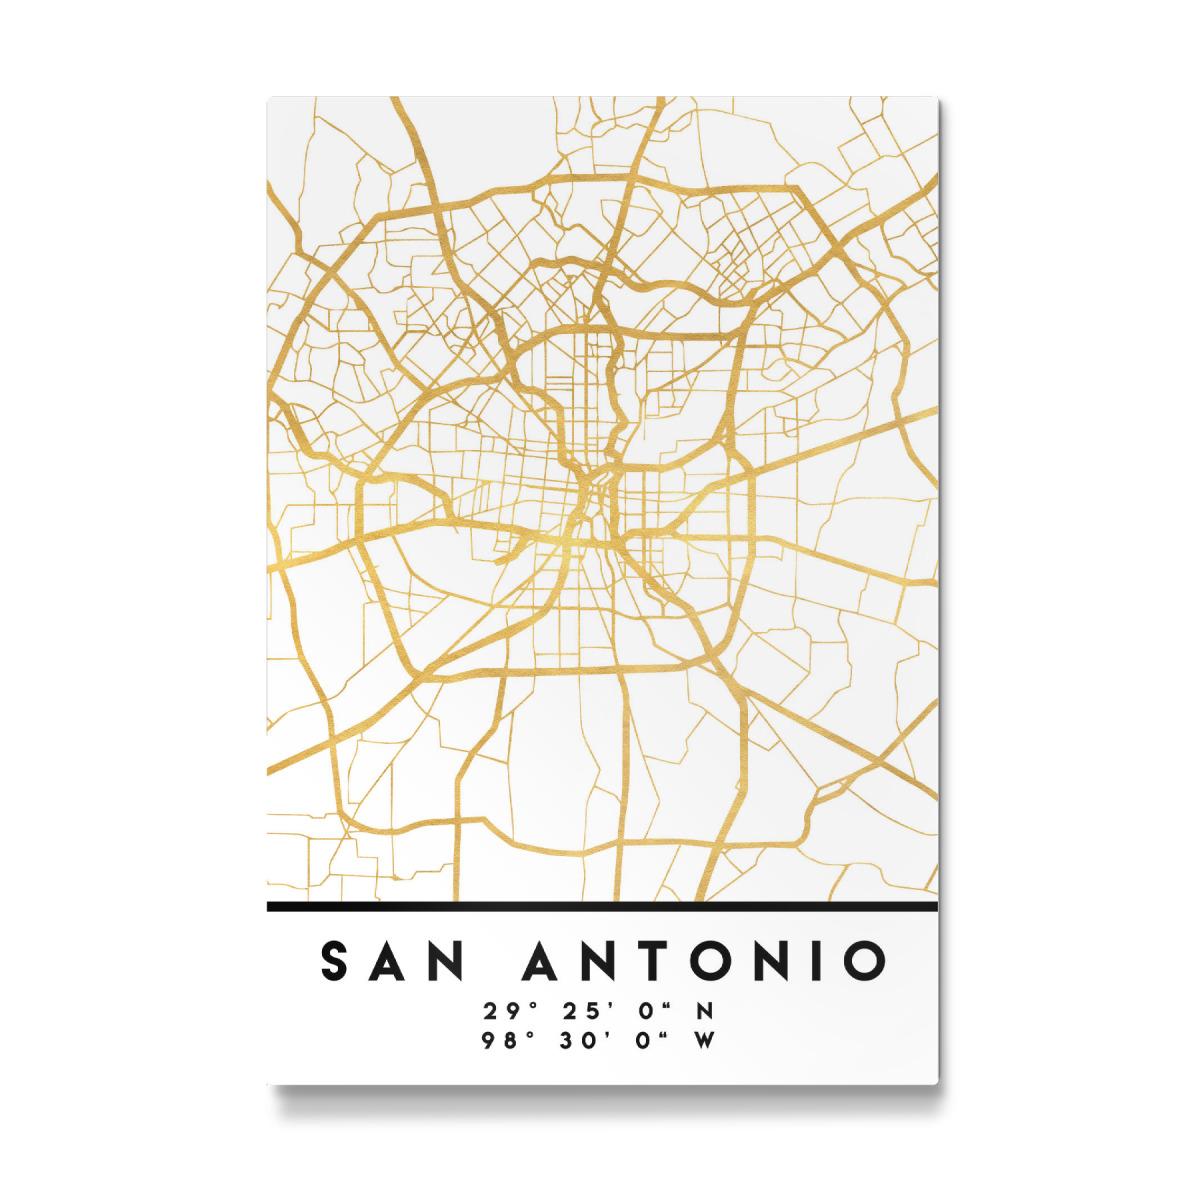 SAN ANTONIO TEXAS STREET MAP als Galerie-Print bei artboxONE ...